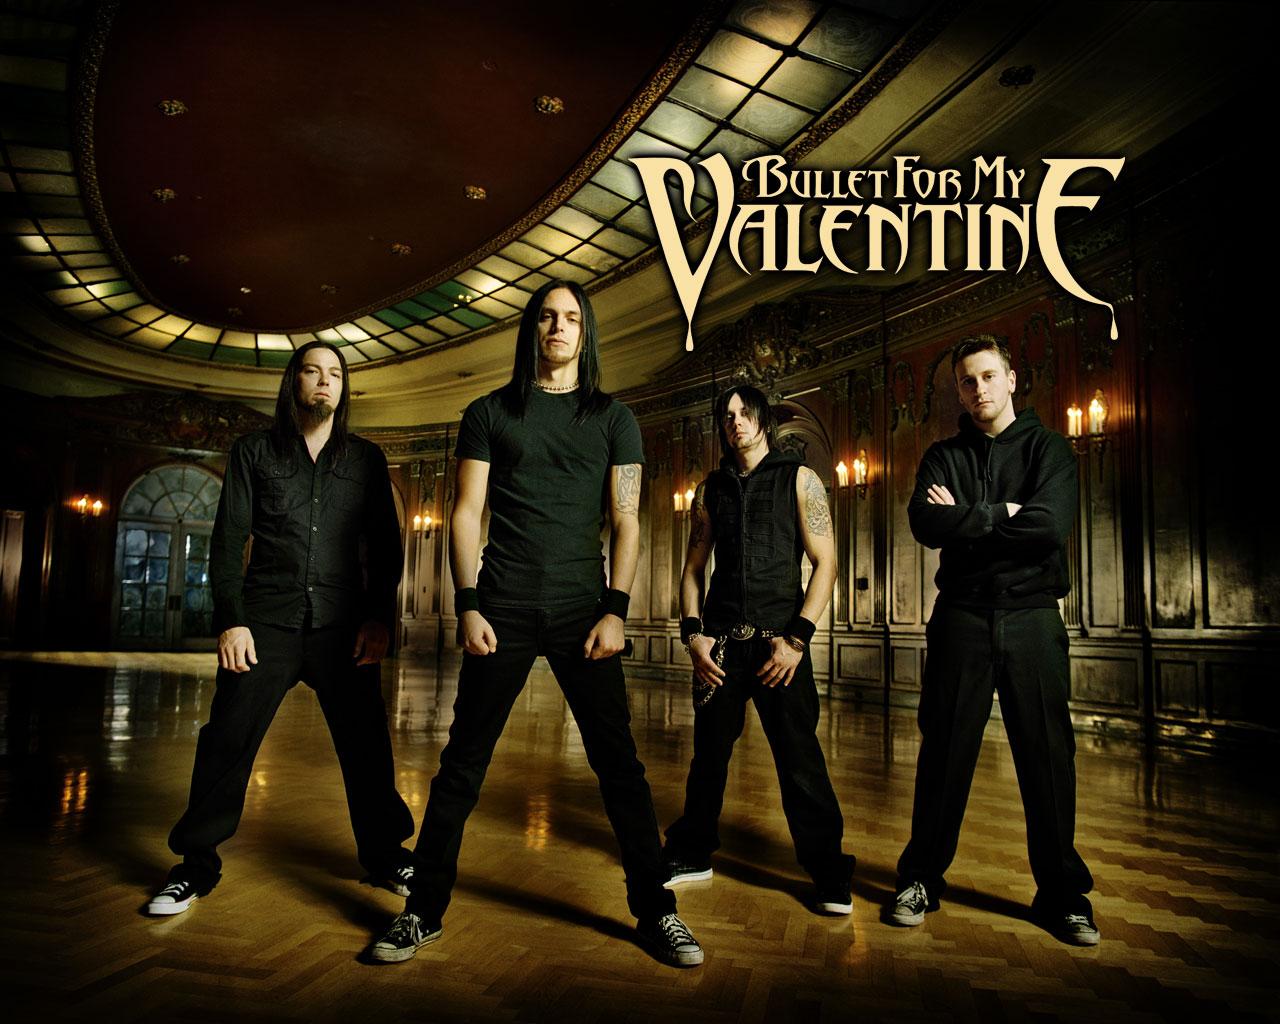 http://2.bp.blogspot.com/-euu_SXElD7E/To0KUI7CiGI/AAAAAAAABU0/YEXn6nHg7Vo/s1600/bullet_for_my_valentine_2.jpg